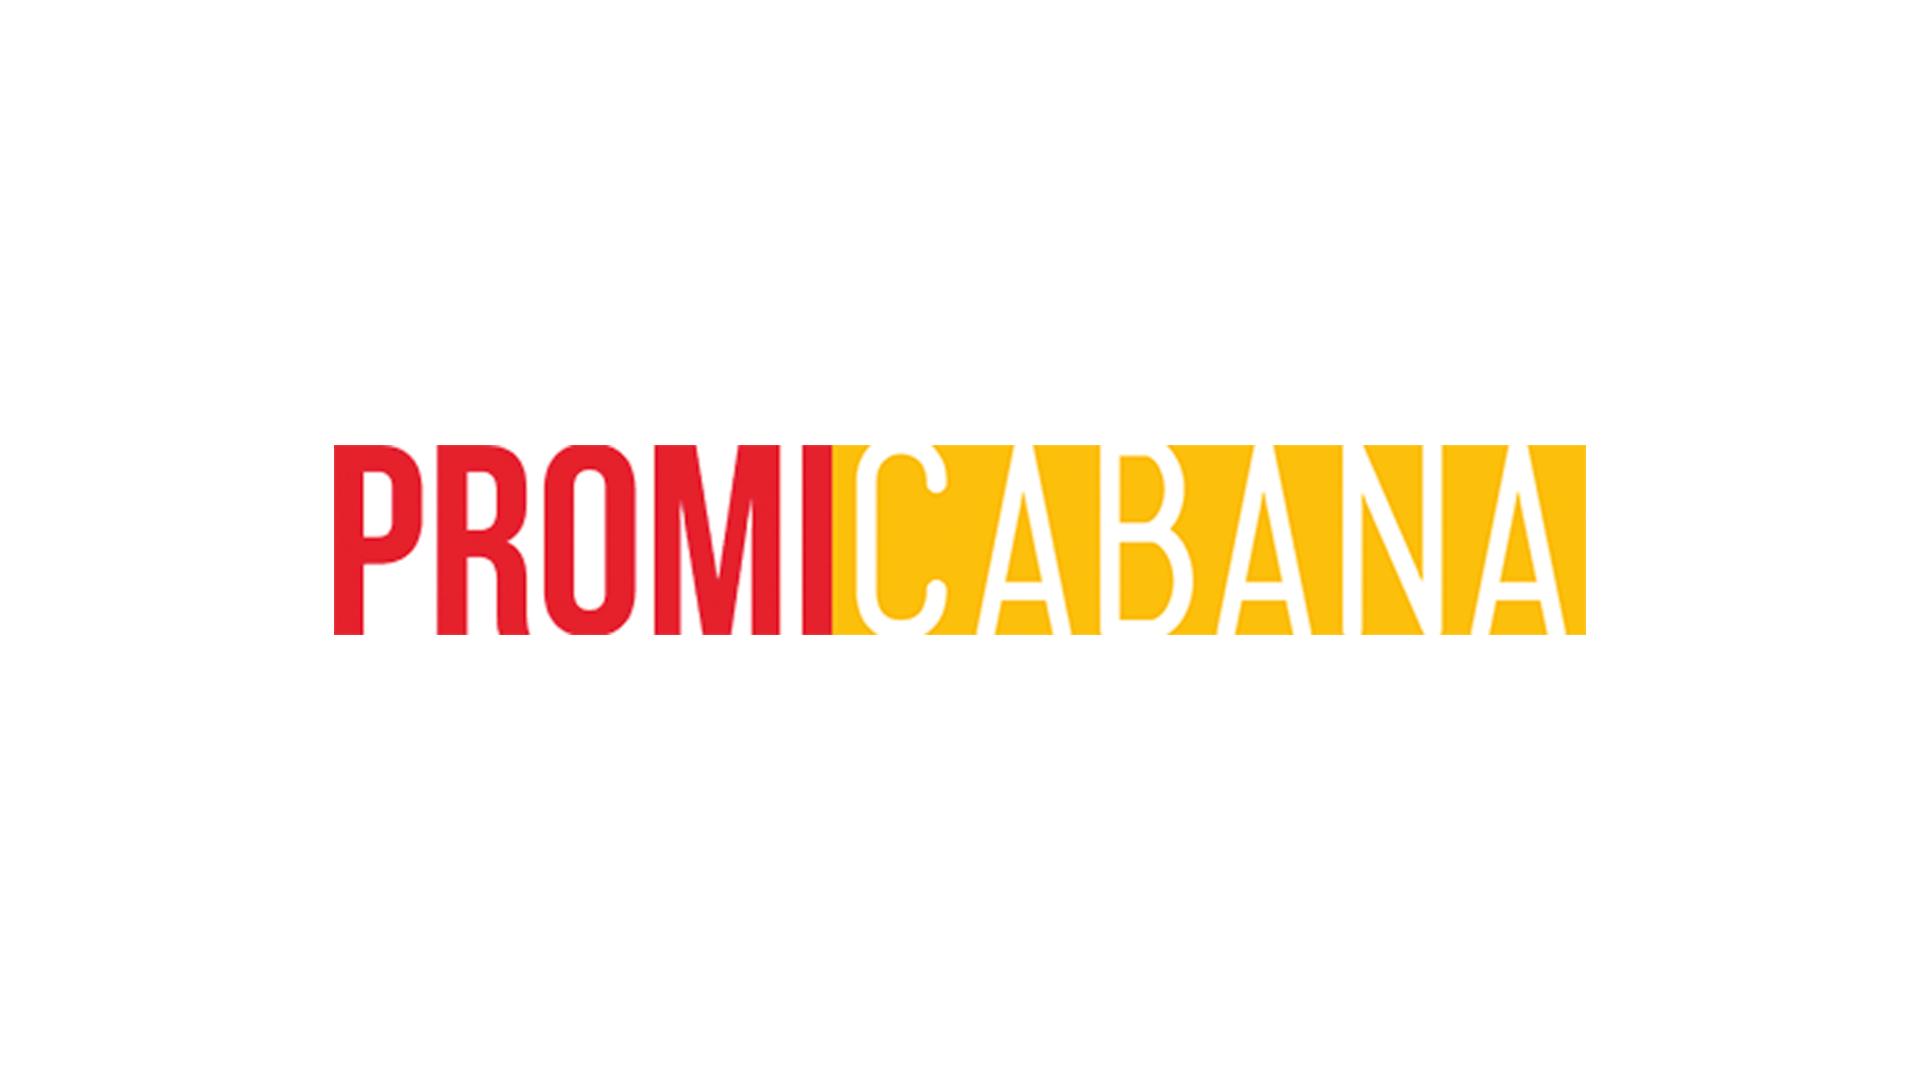 Ed-Sheeran-All-of-the-Stars-Musikvideo